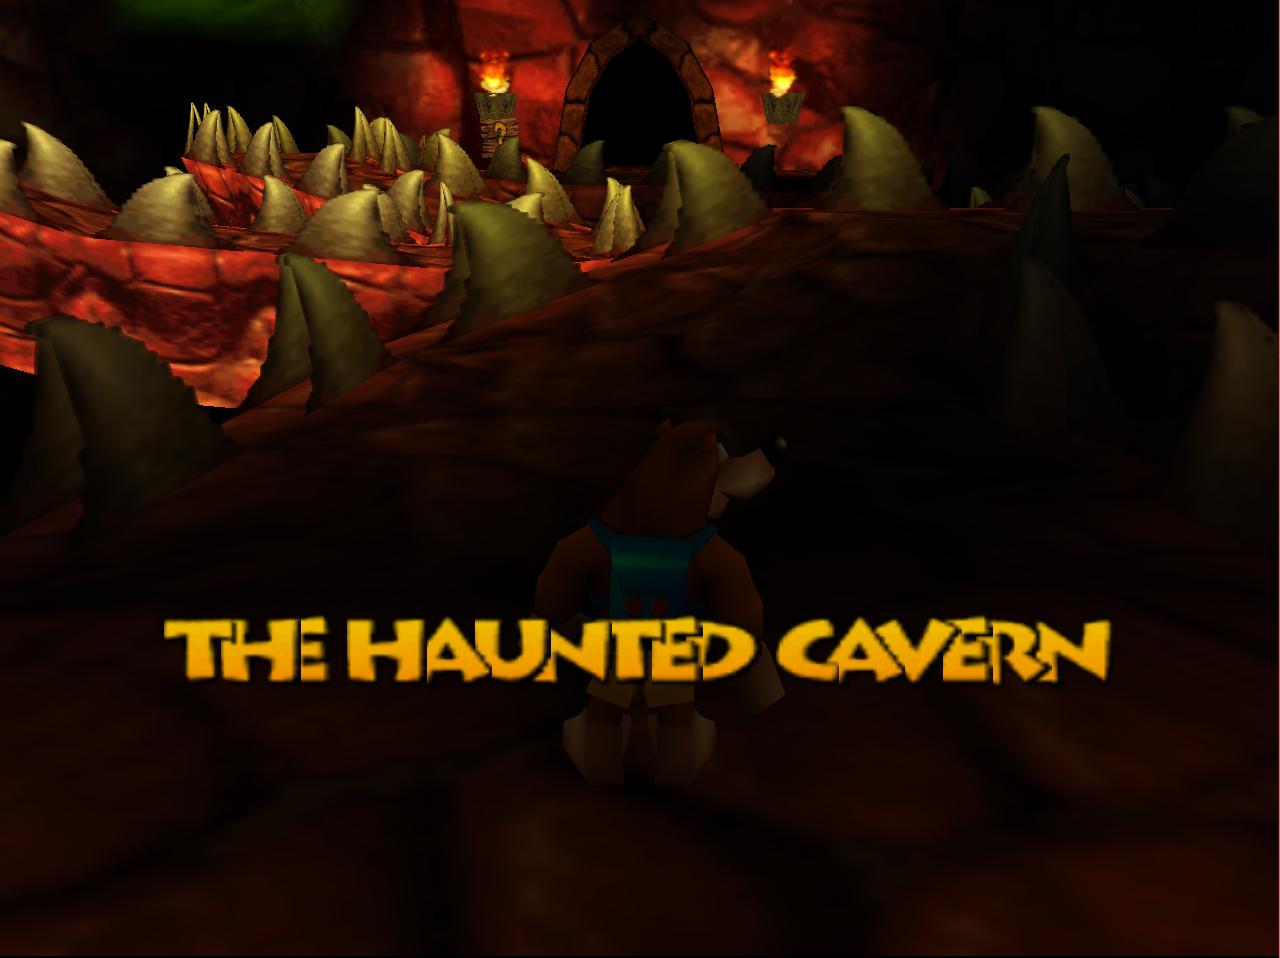 The Haunted Cavern